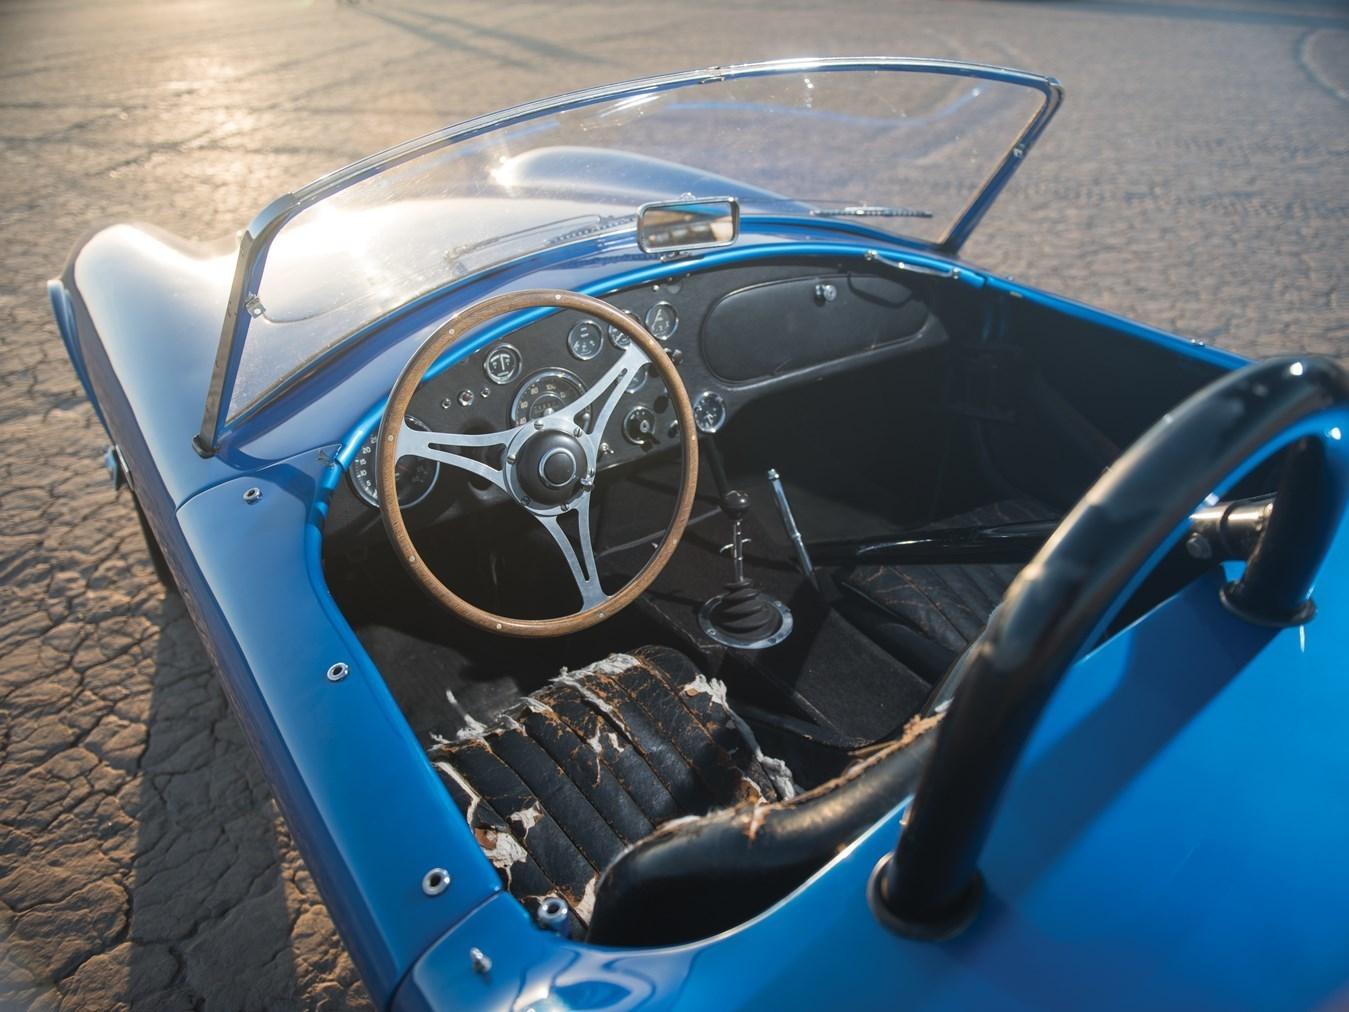 Эксклюзивный Shelby Cobra продан на аукционе за почти $14 млн 3